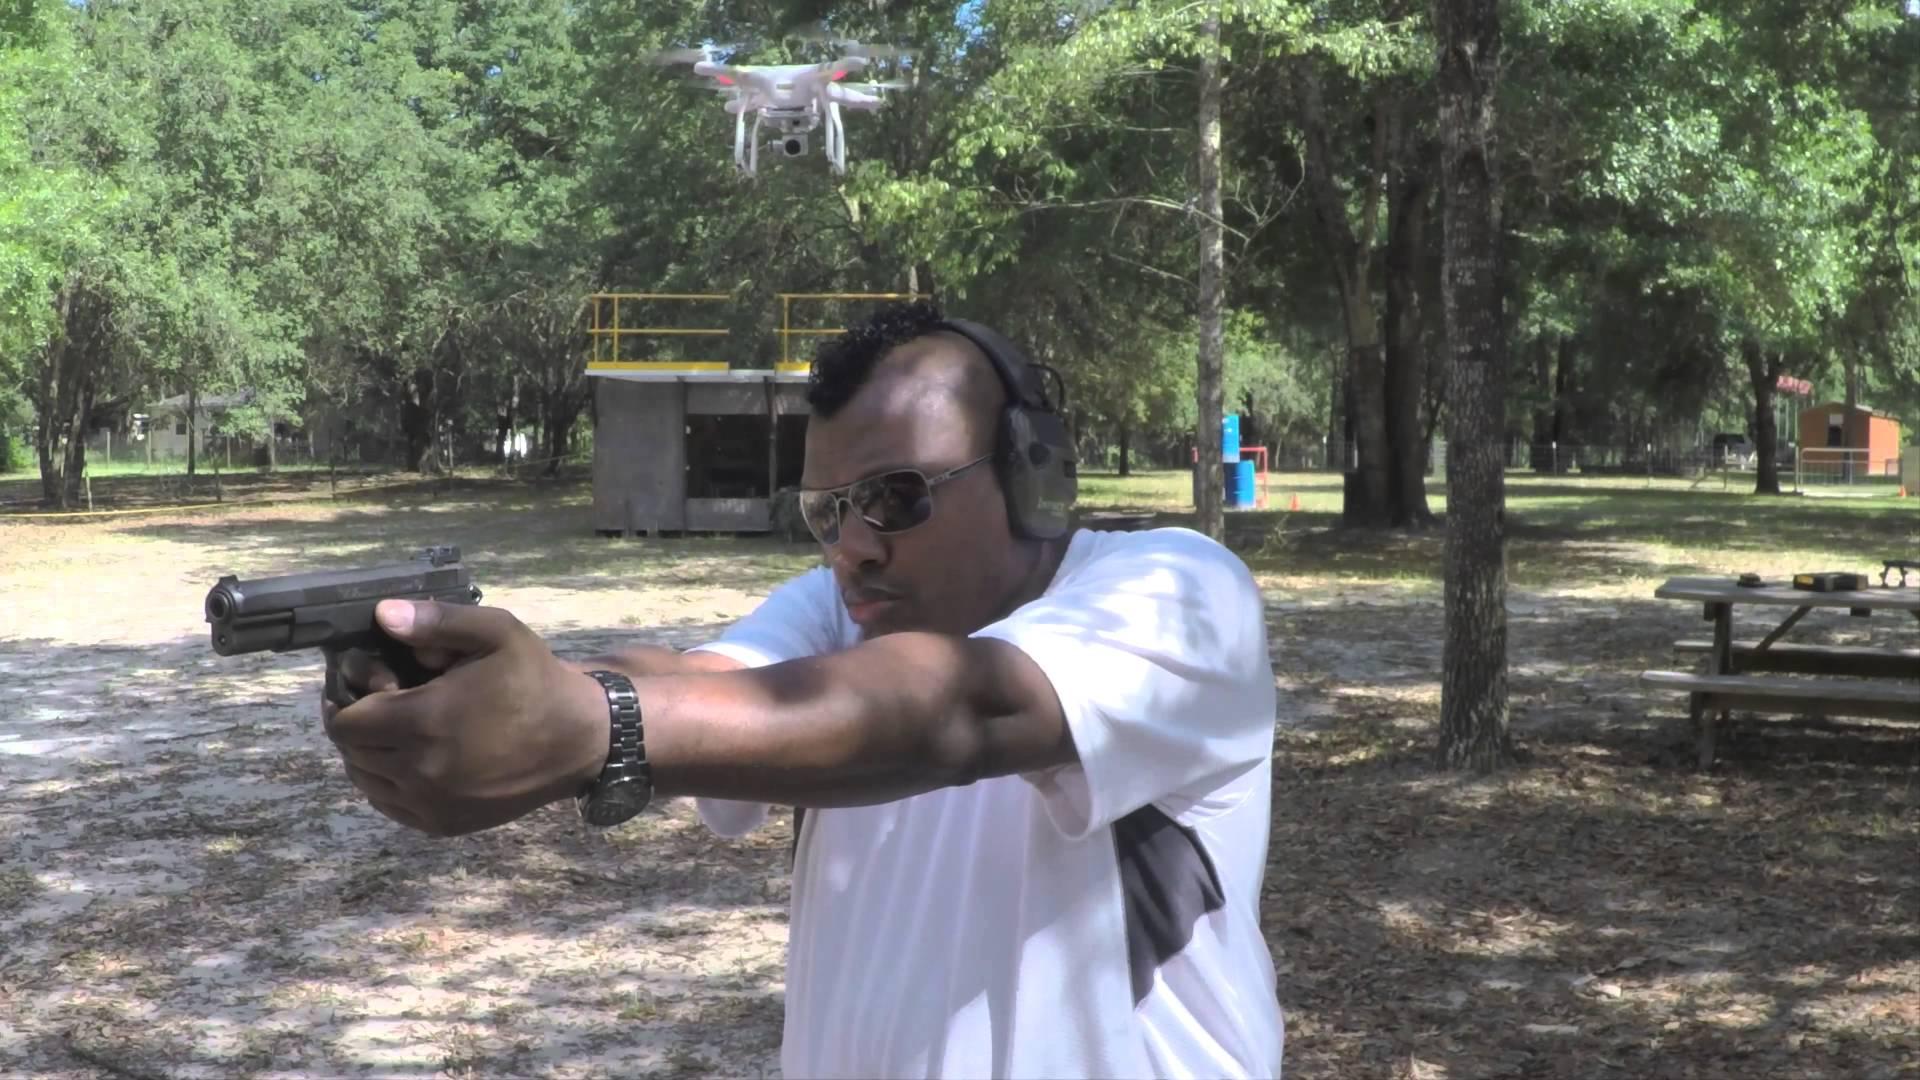 CZ 75 Shadow 9mm Pistol on THE HACIENDA 4K